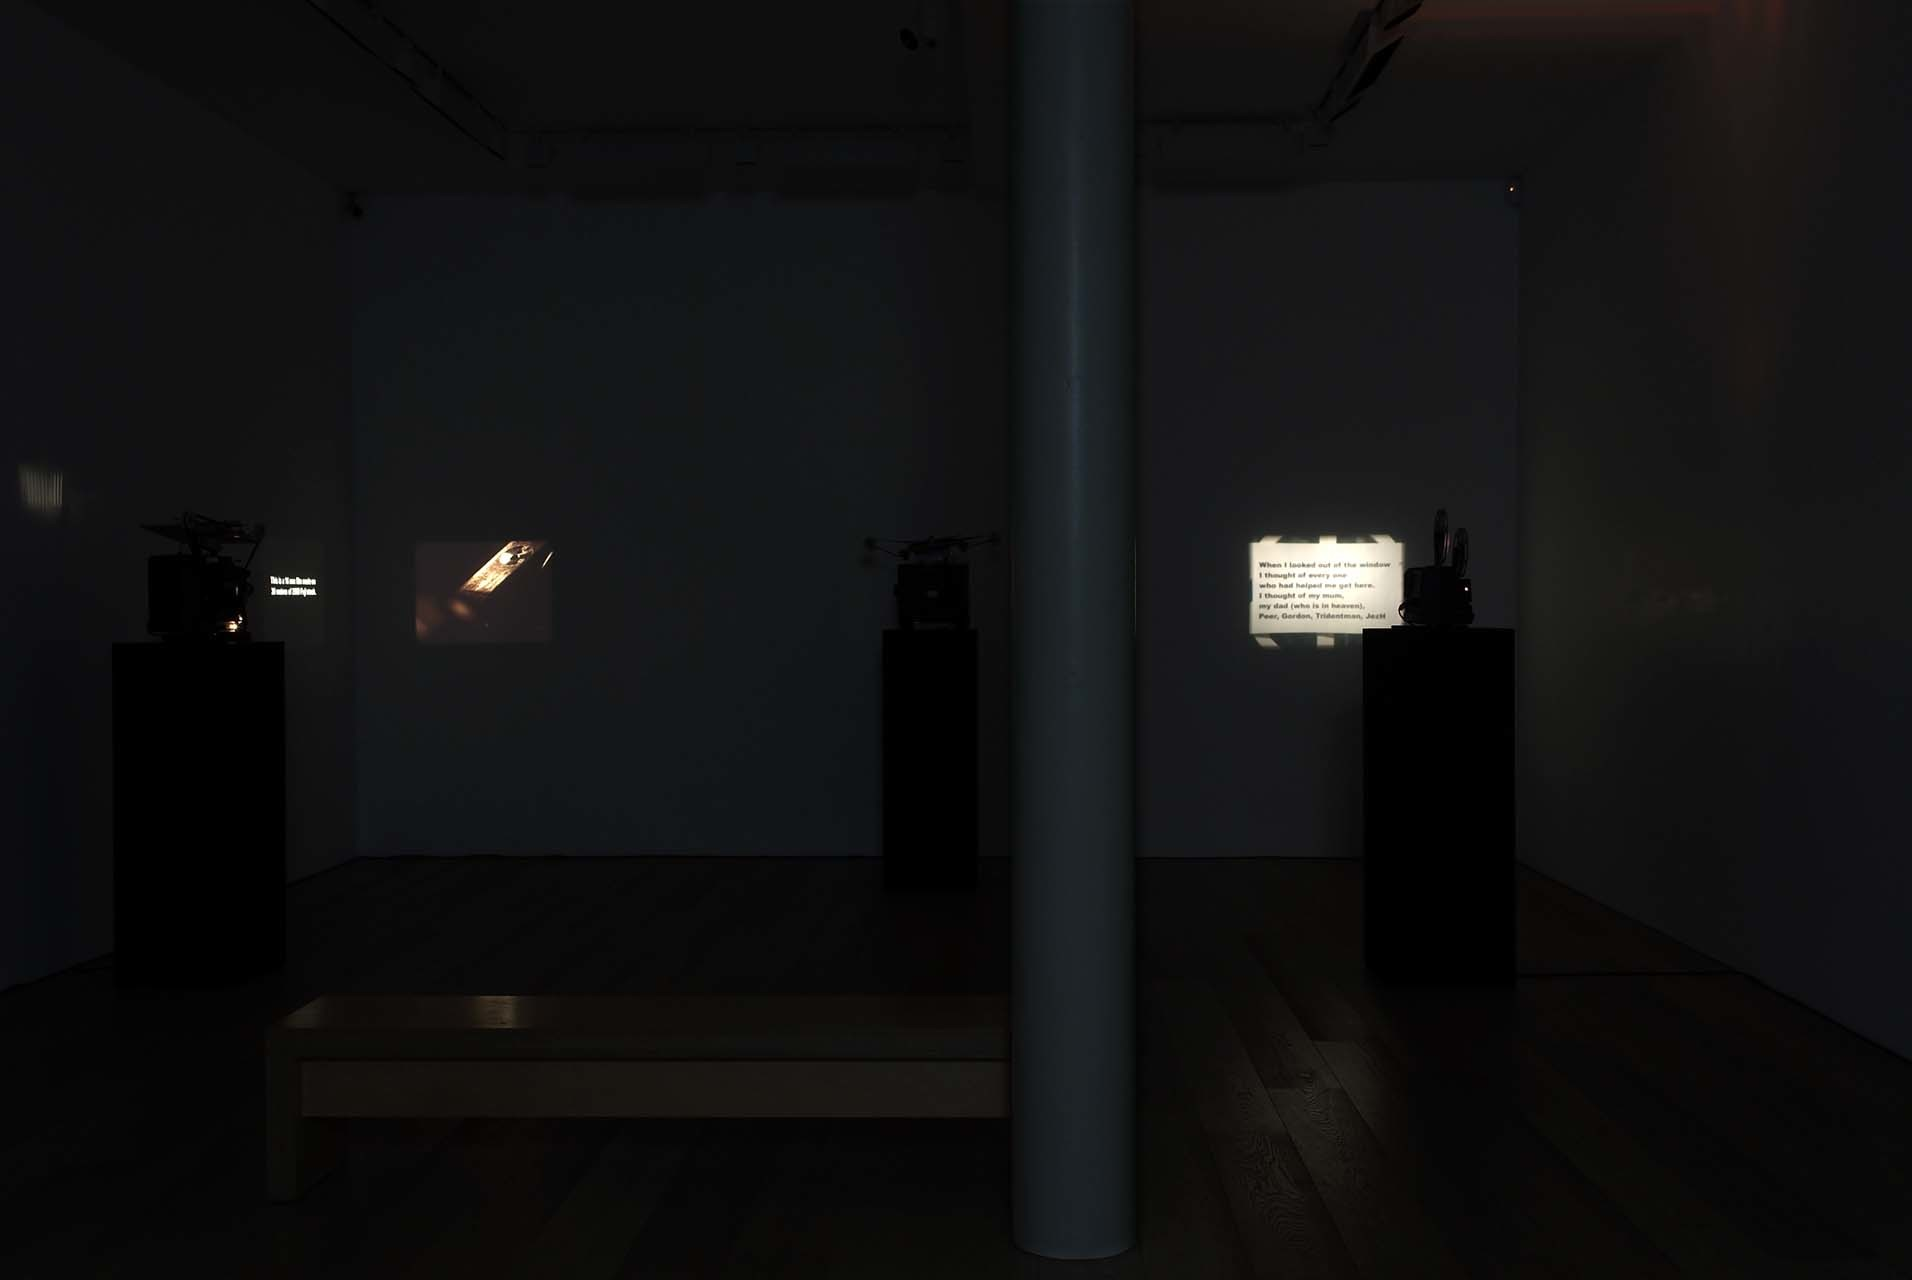 <p>Installation View, Wilhelm Sasnal</p><p></p>